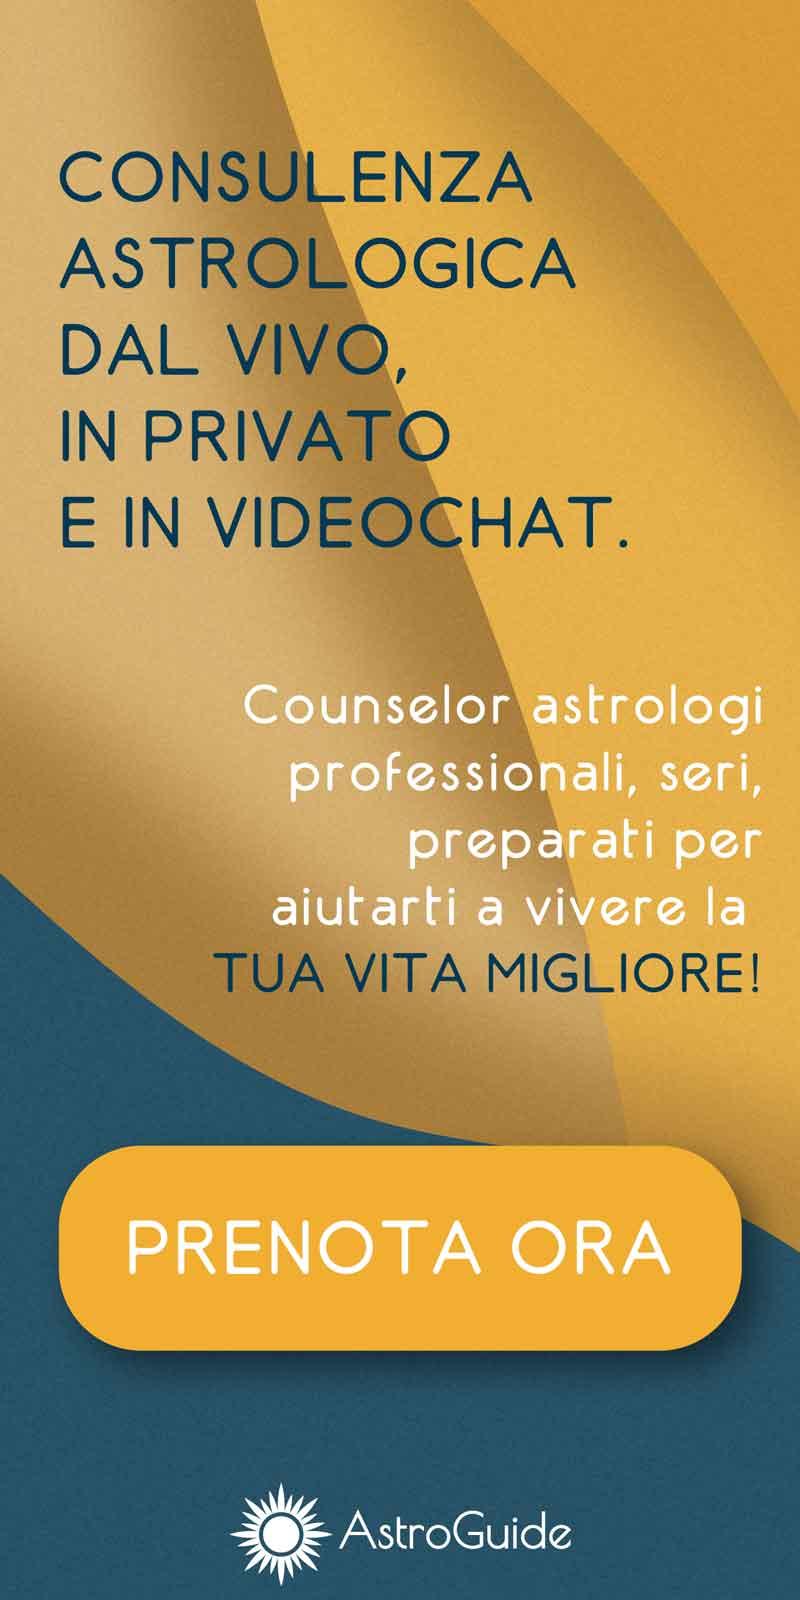 astrologia dal vivo